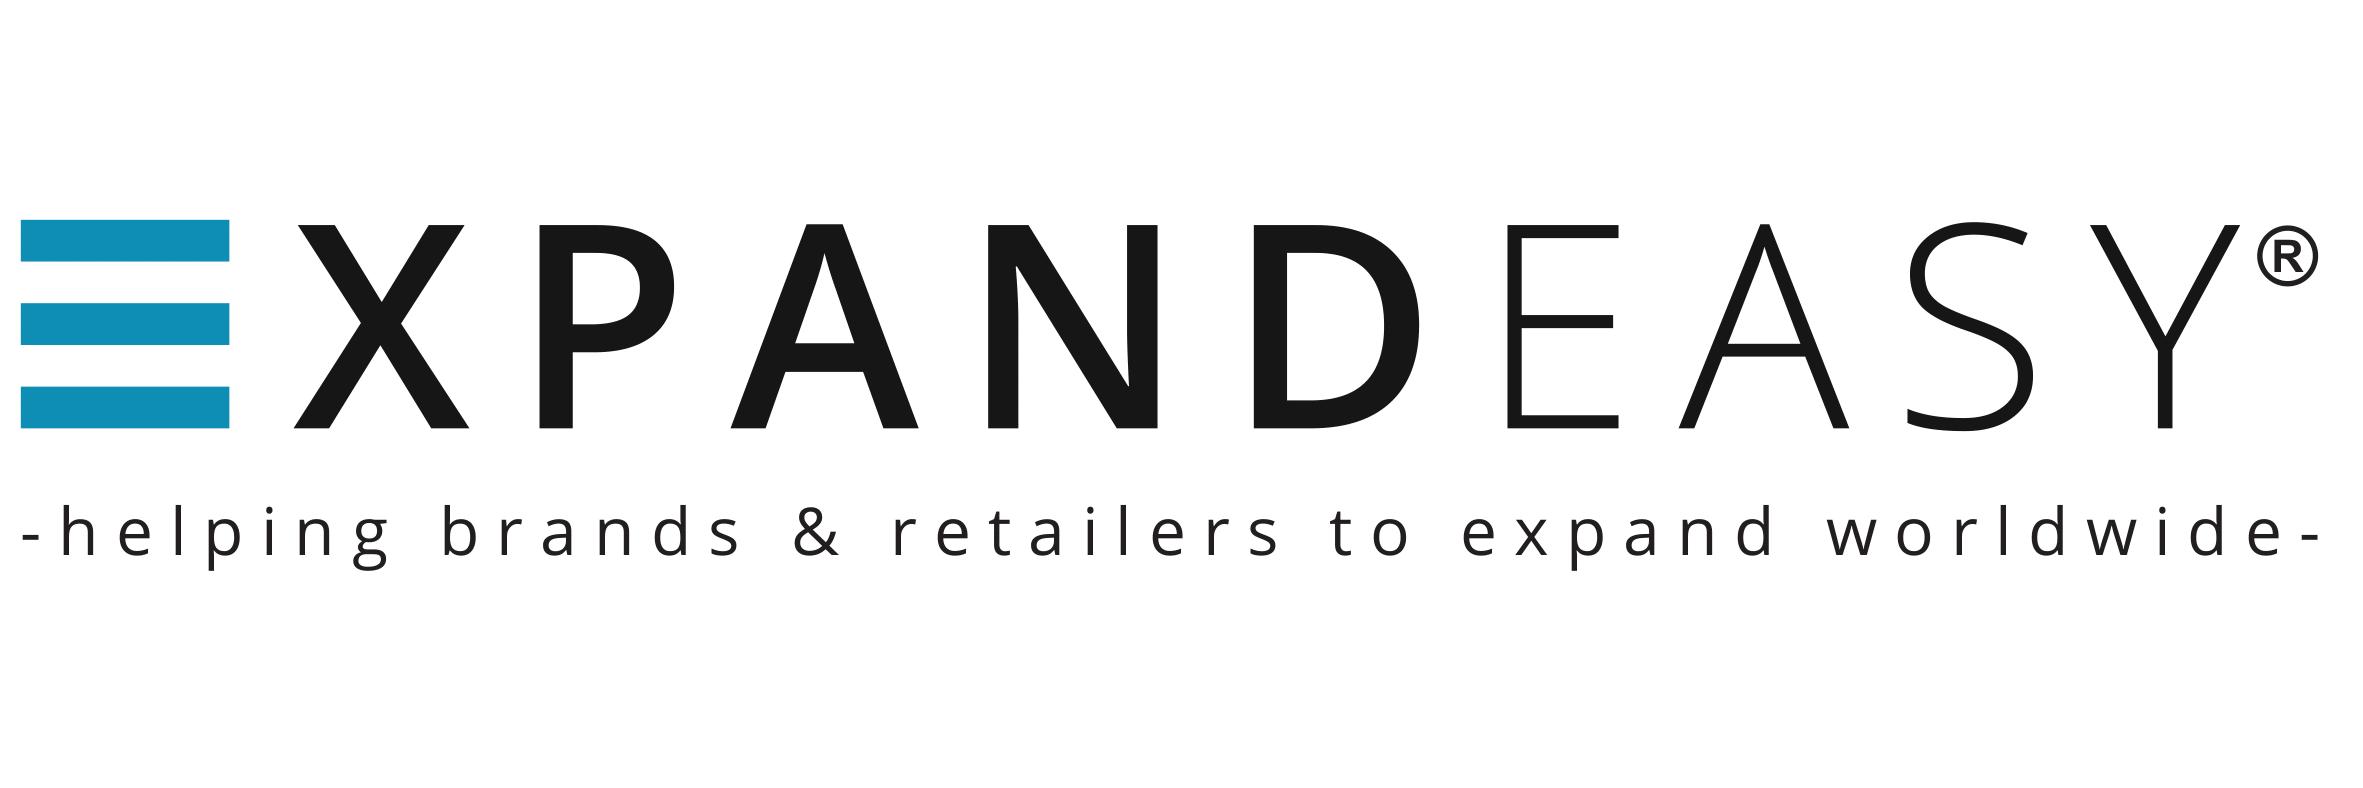 Expandeasy – Expansionsmanagement GmbH Logo